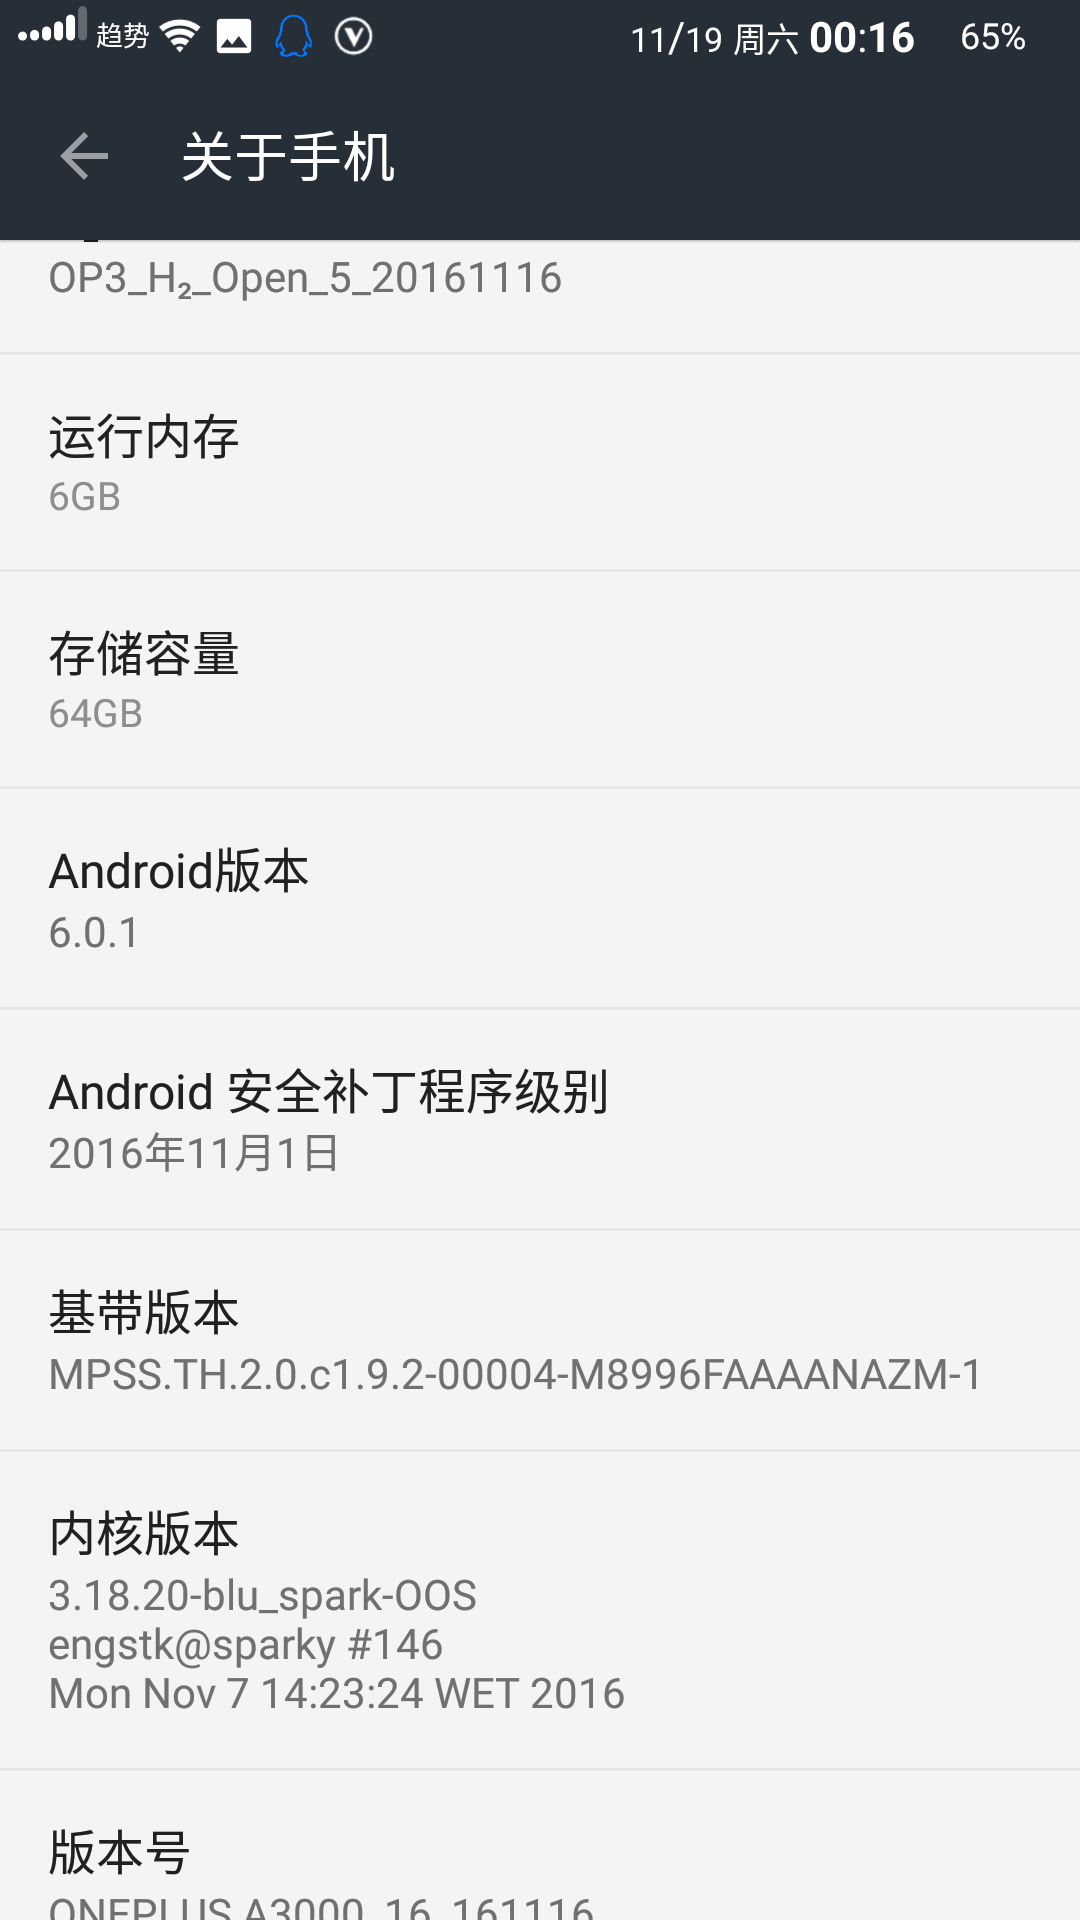 Screenshot_20161119-001646.png